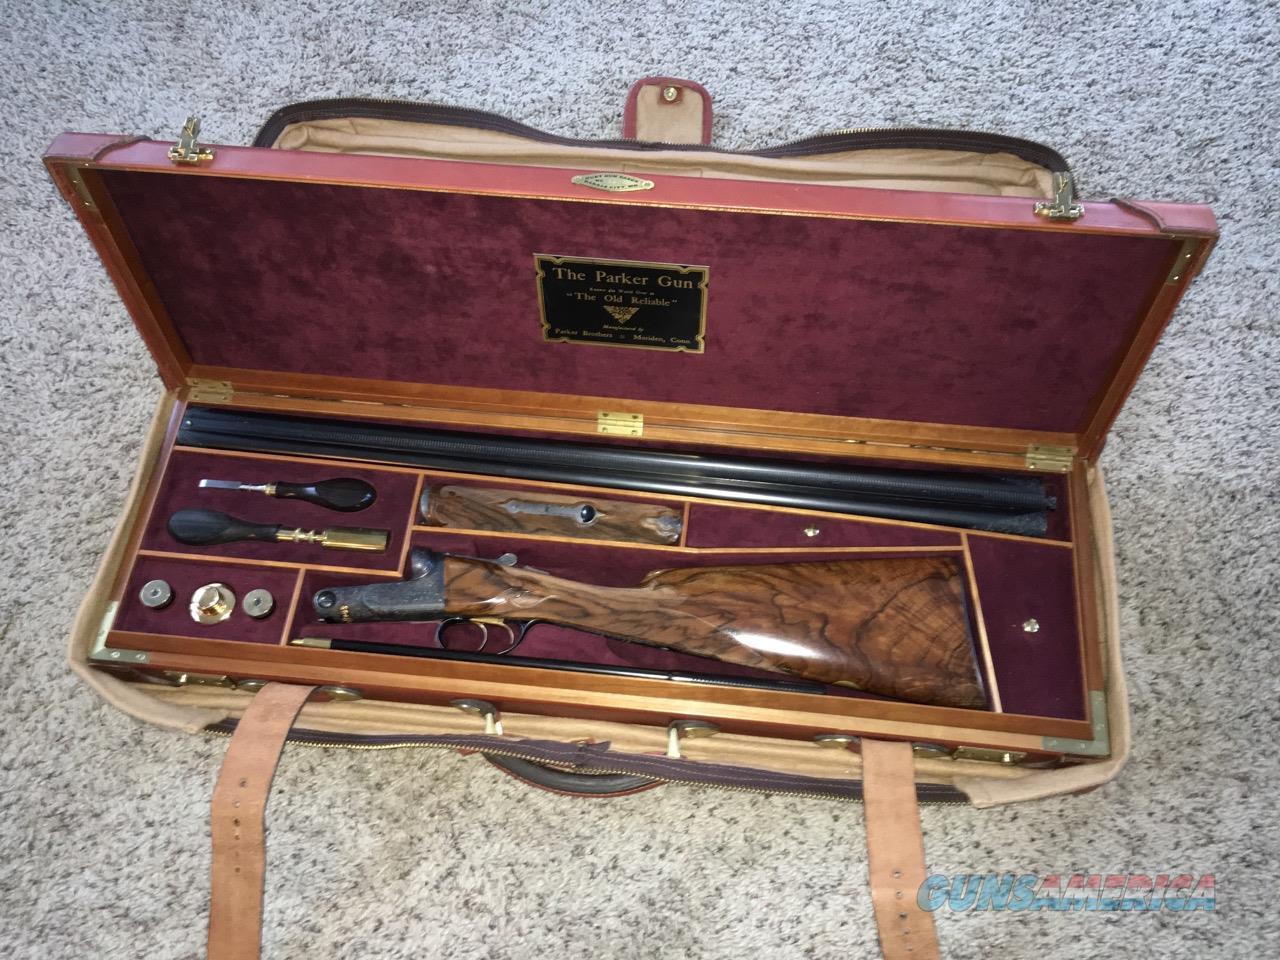 Parker A-1 12 ga Upgrade by McCombs, Haugh, Huey, Price Reduced  Guns > Shotguns > Parker Shotguns